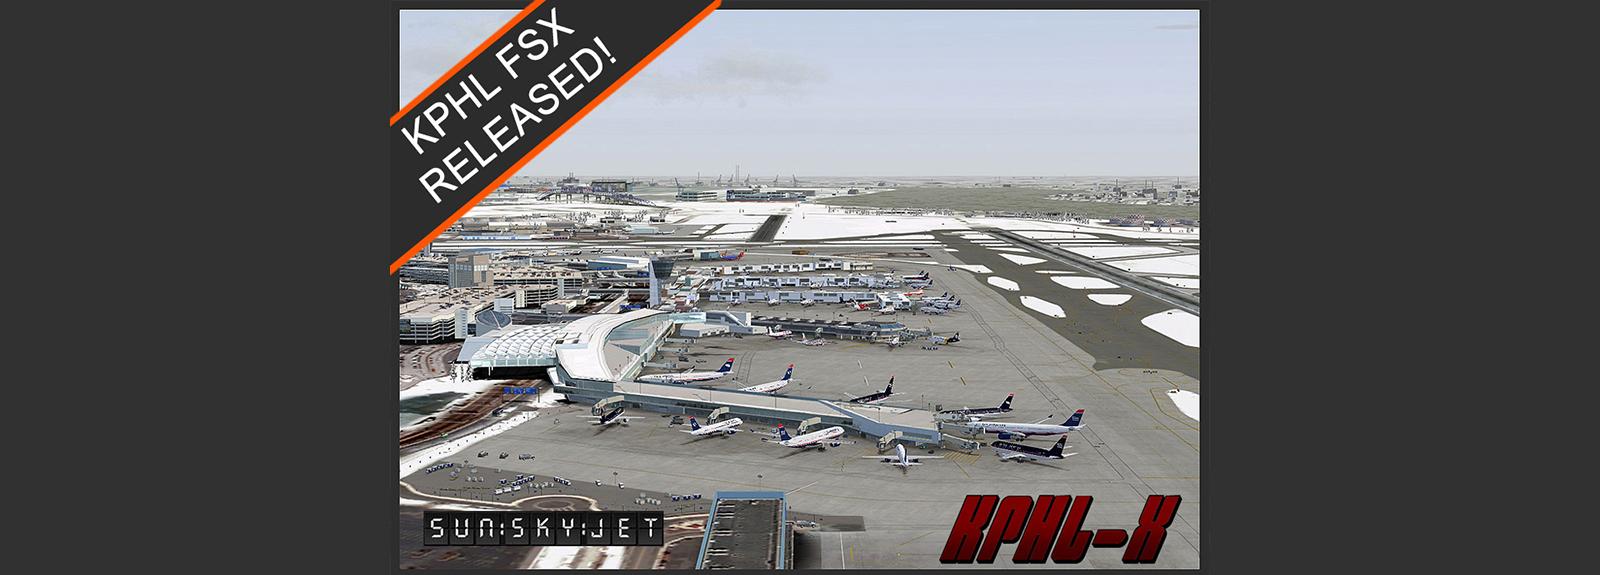 SunSkyJet Studios Betasite – Premier Freeware Sceneries For